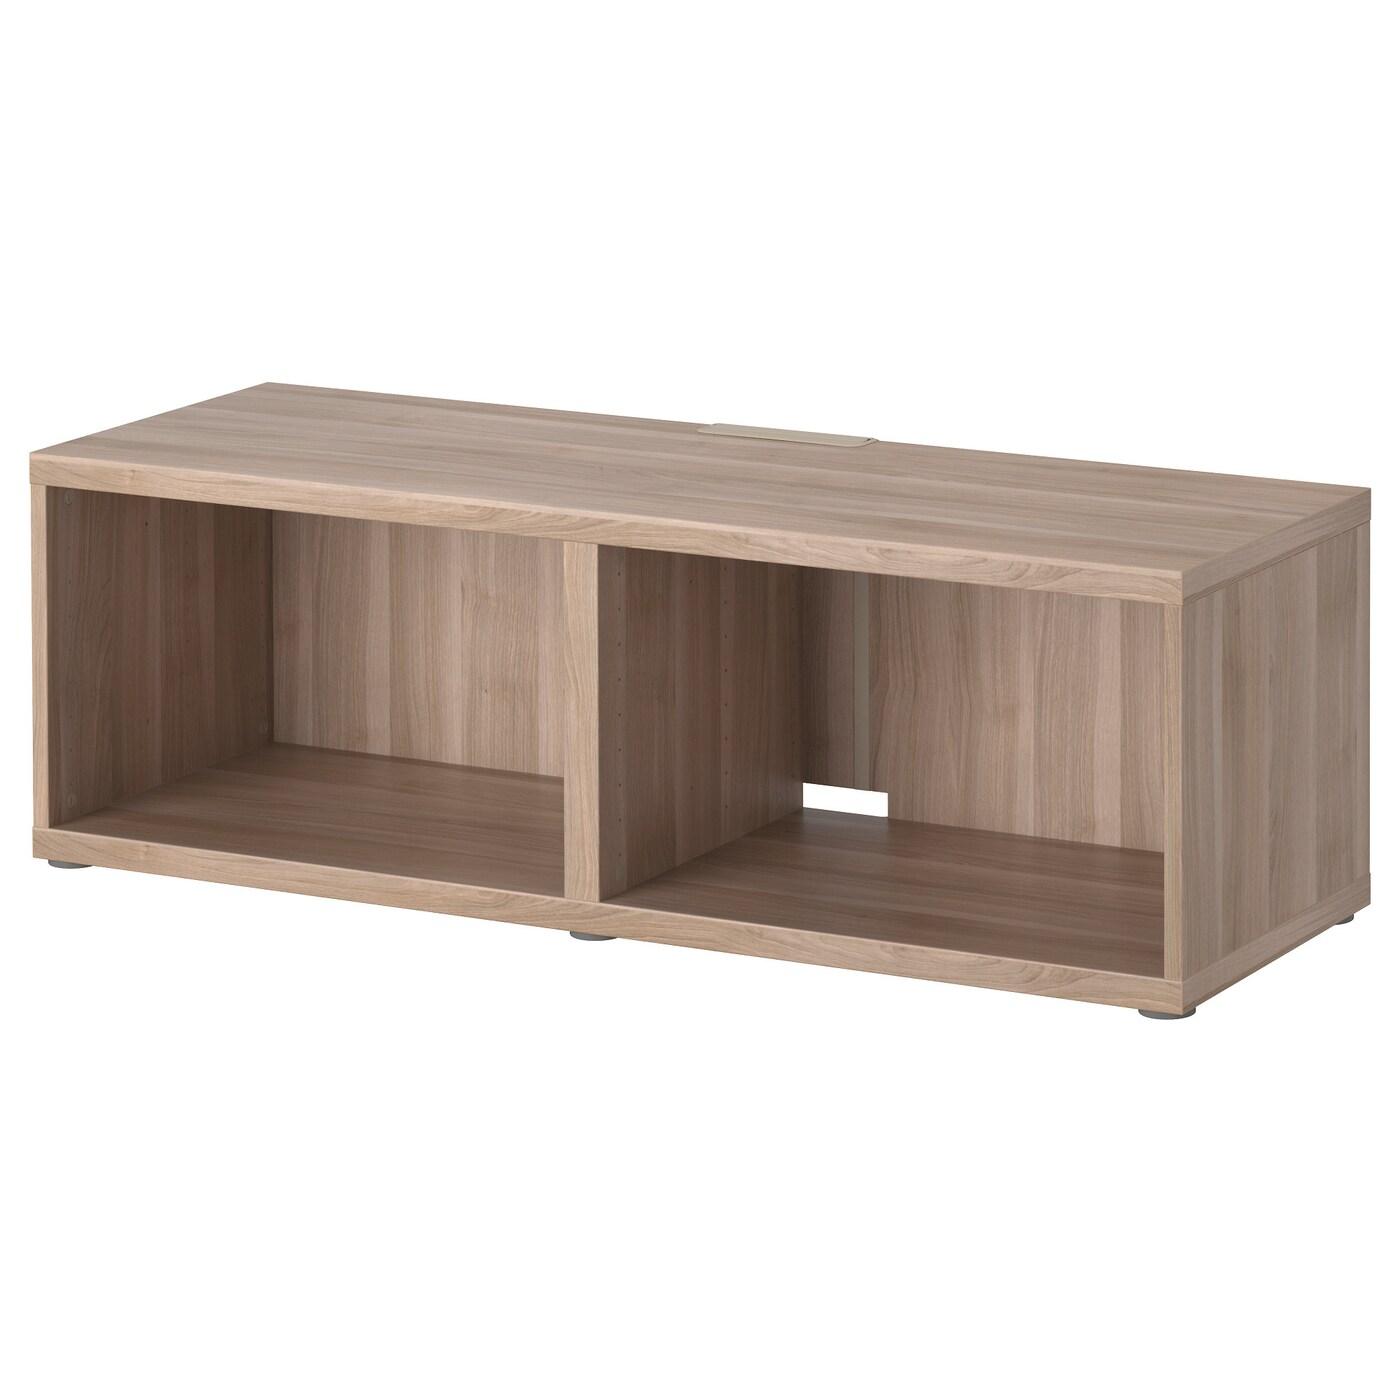 best banc tv motif noyer teint gris 120x40x38 cm ikea. Black Bedroom Furniture Sets. Home Design Ideas